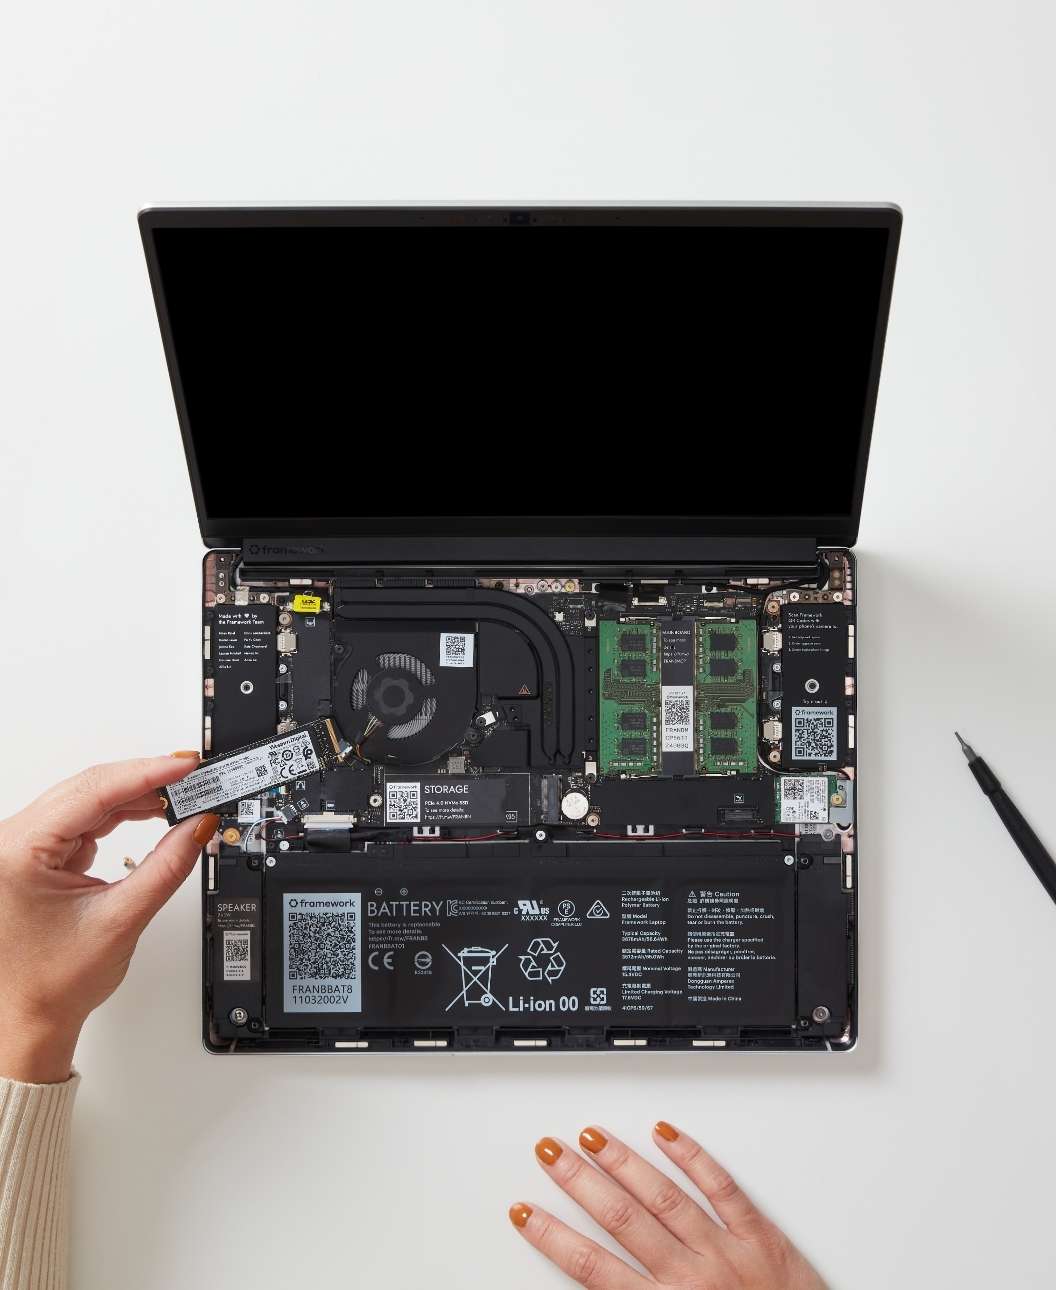 Storage install